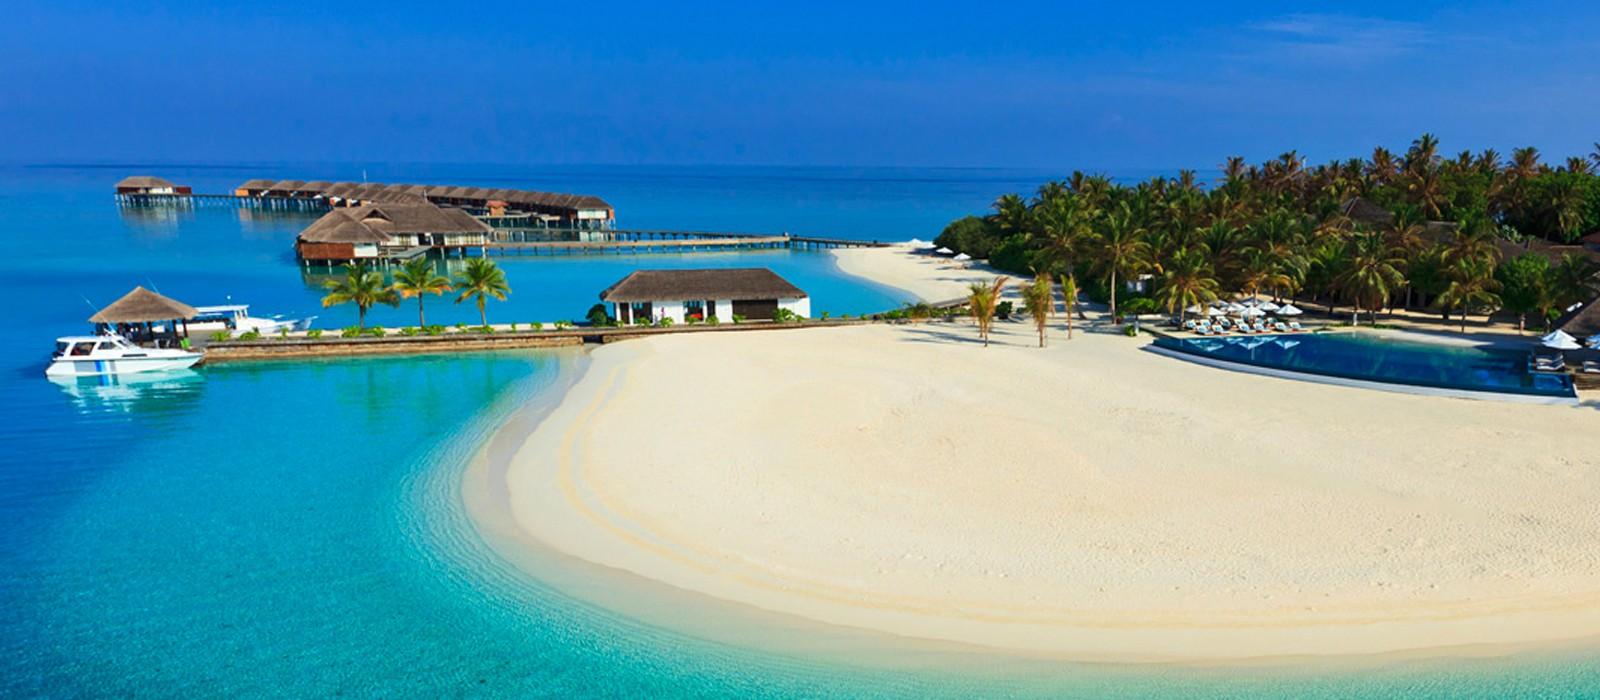 PD header - Luxury - Holidays - Maldives - Valassaru - Restaurant